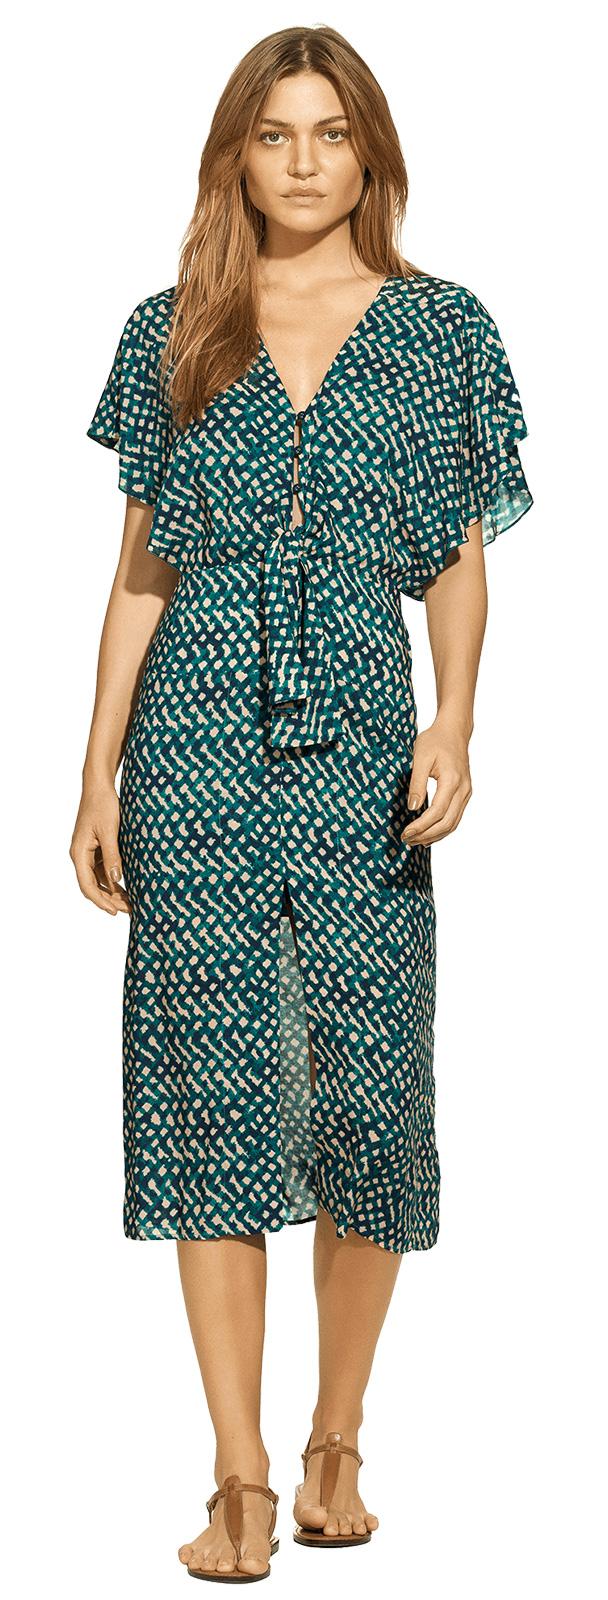 98cbda50766a Luxurious Belted Green Print Beach Dress - Ali Midi Dress Nias - VIX